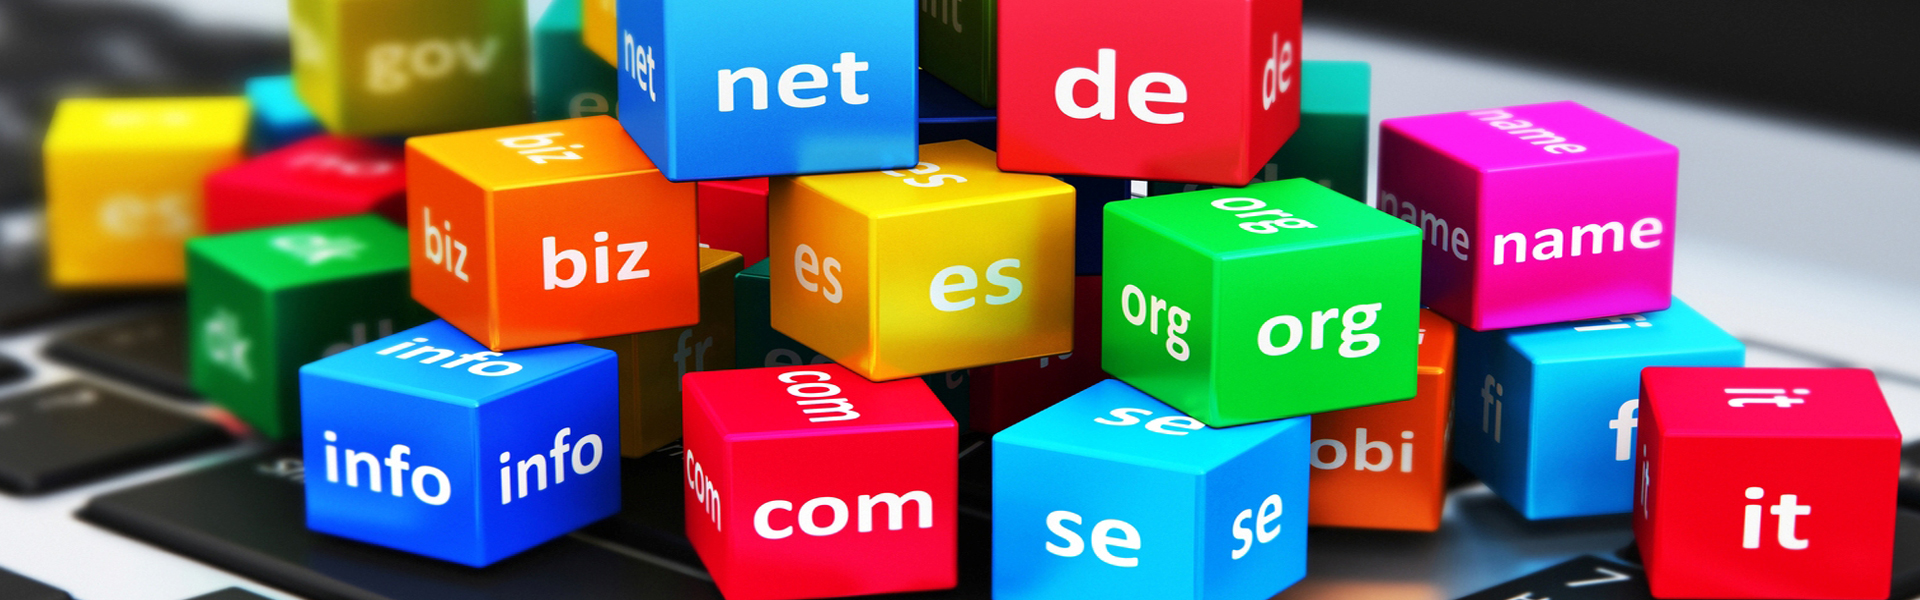 bs-art_domain-registration